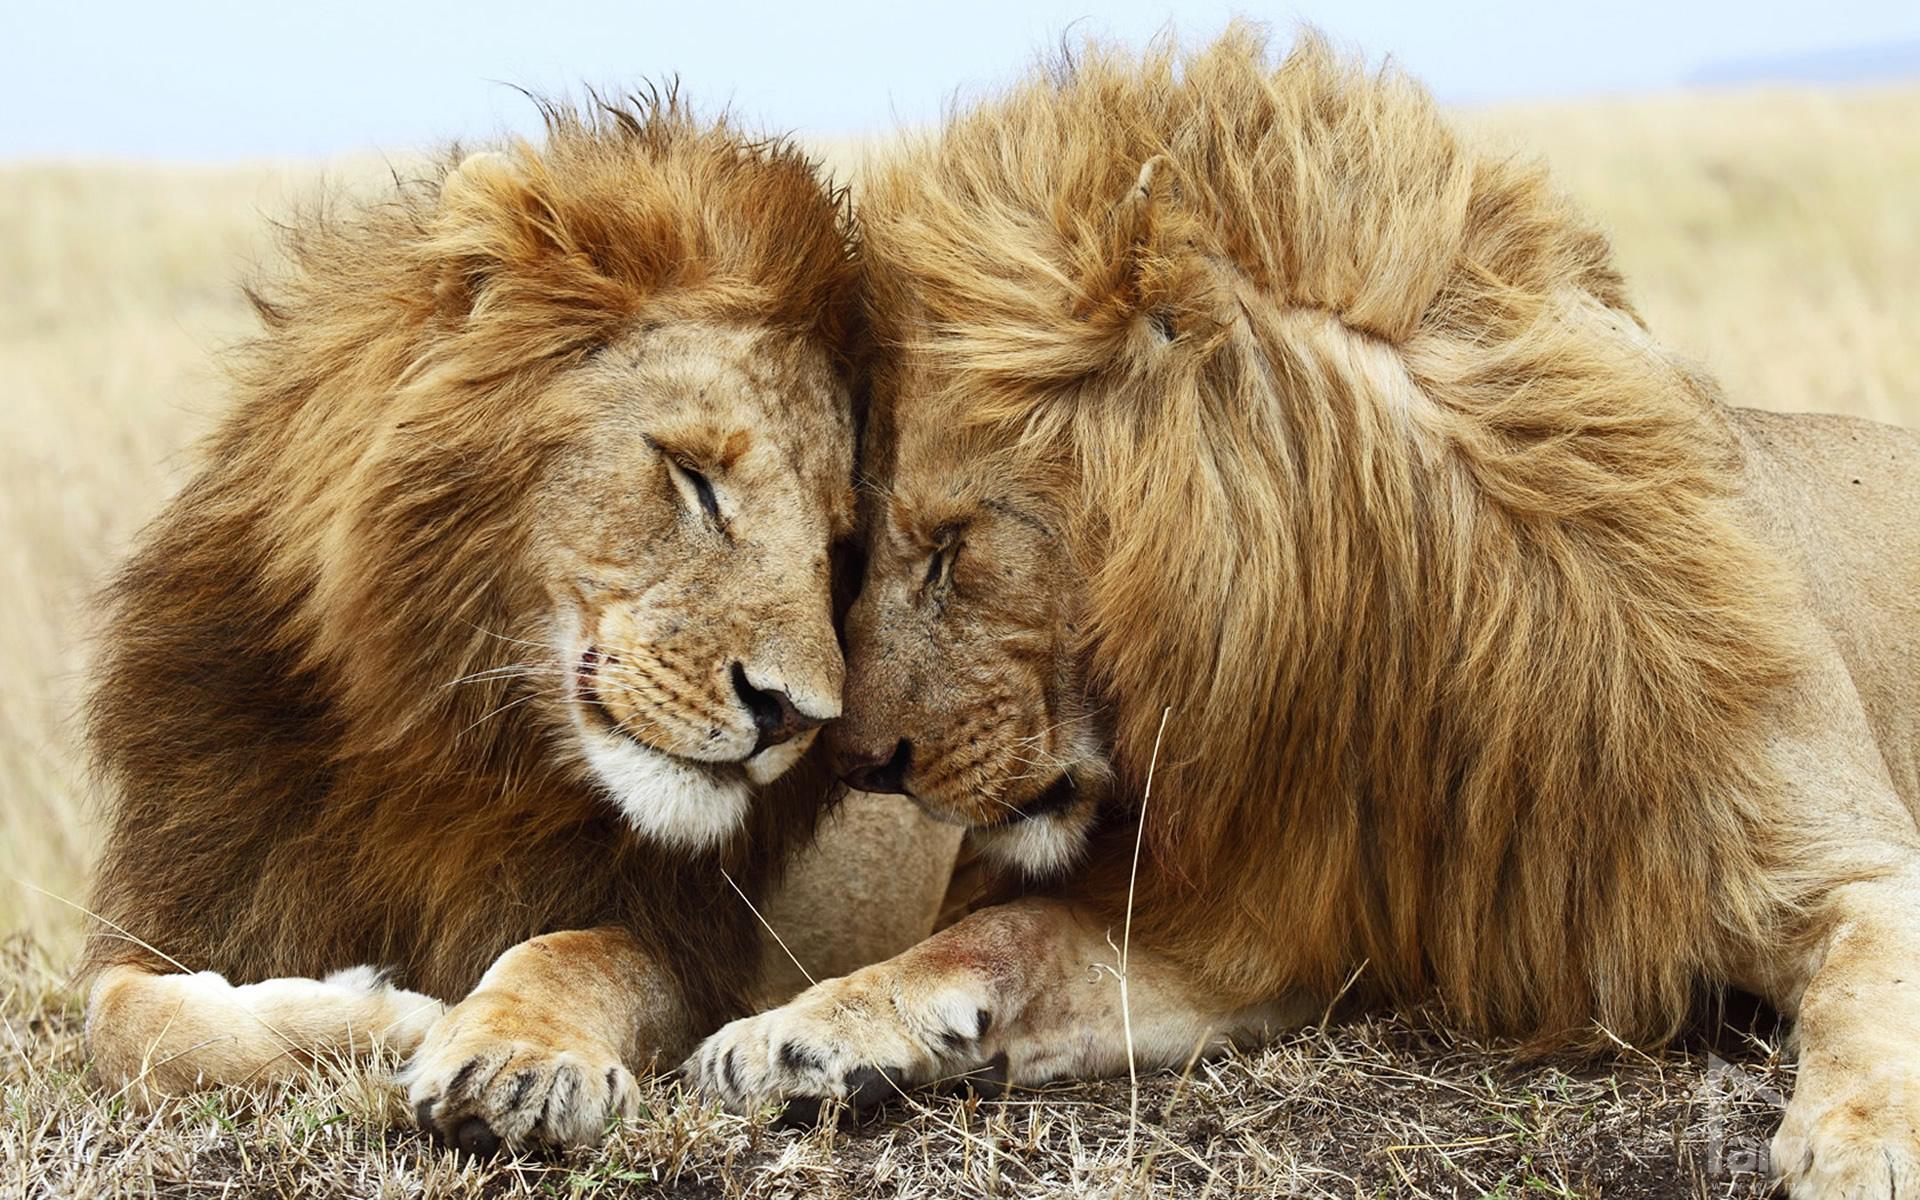 lion wallpaper mobile